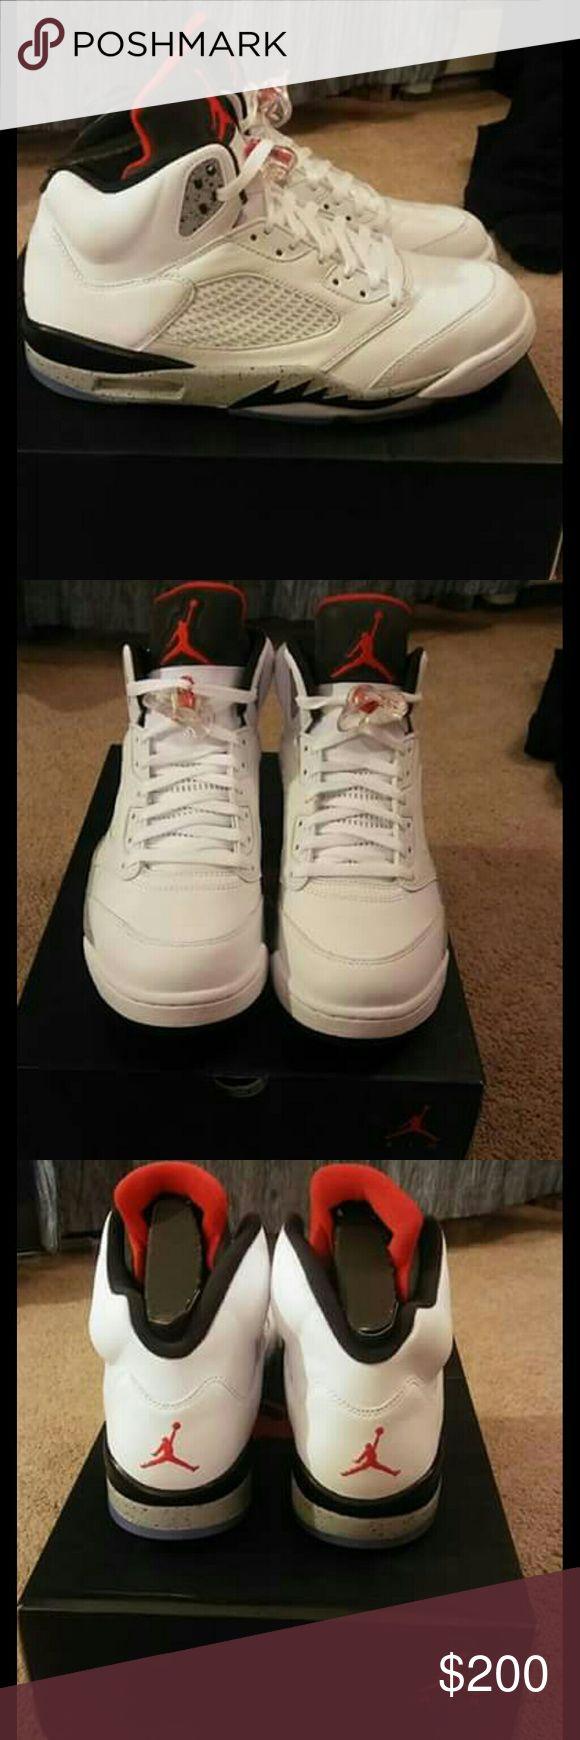 "Jordan Retro 5 Jordan Retro 5 ""Cements""  Size 12 Mens  Condition 10/10 dead stock 100% Authentic  100% Buyers Protection Gaurentee Jordan Shoes Sneakers"